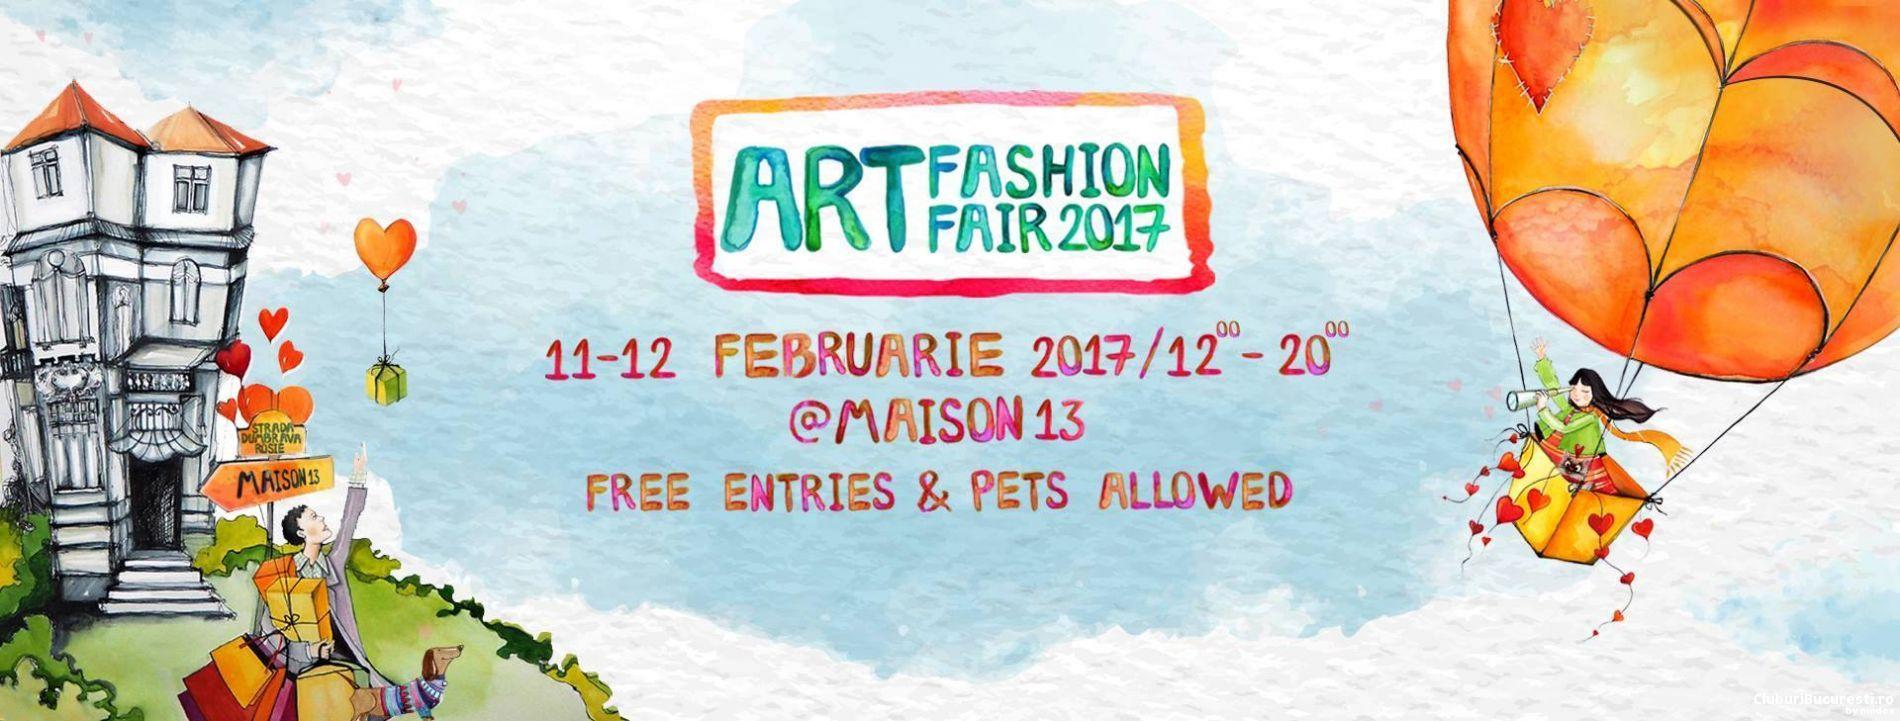 Art Fashion Fair, cadouri inedite de Valentines Day